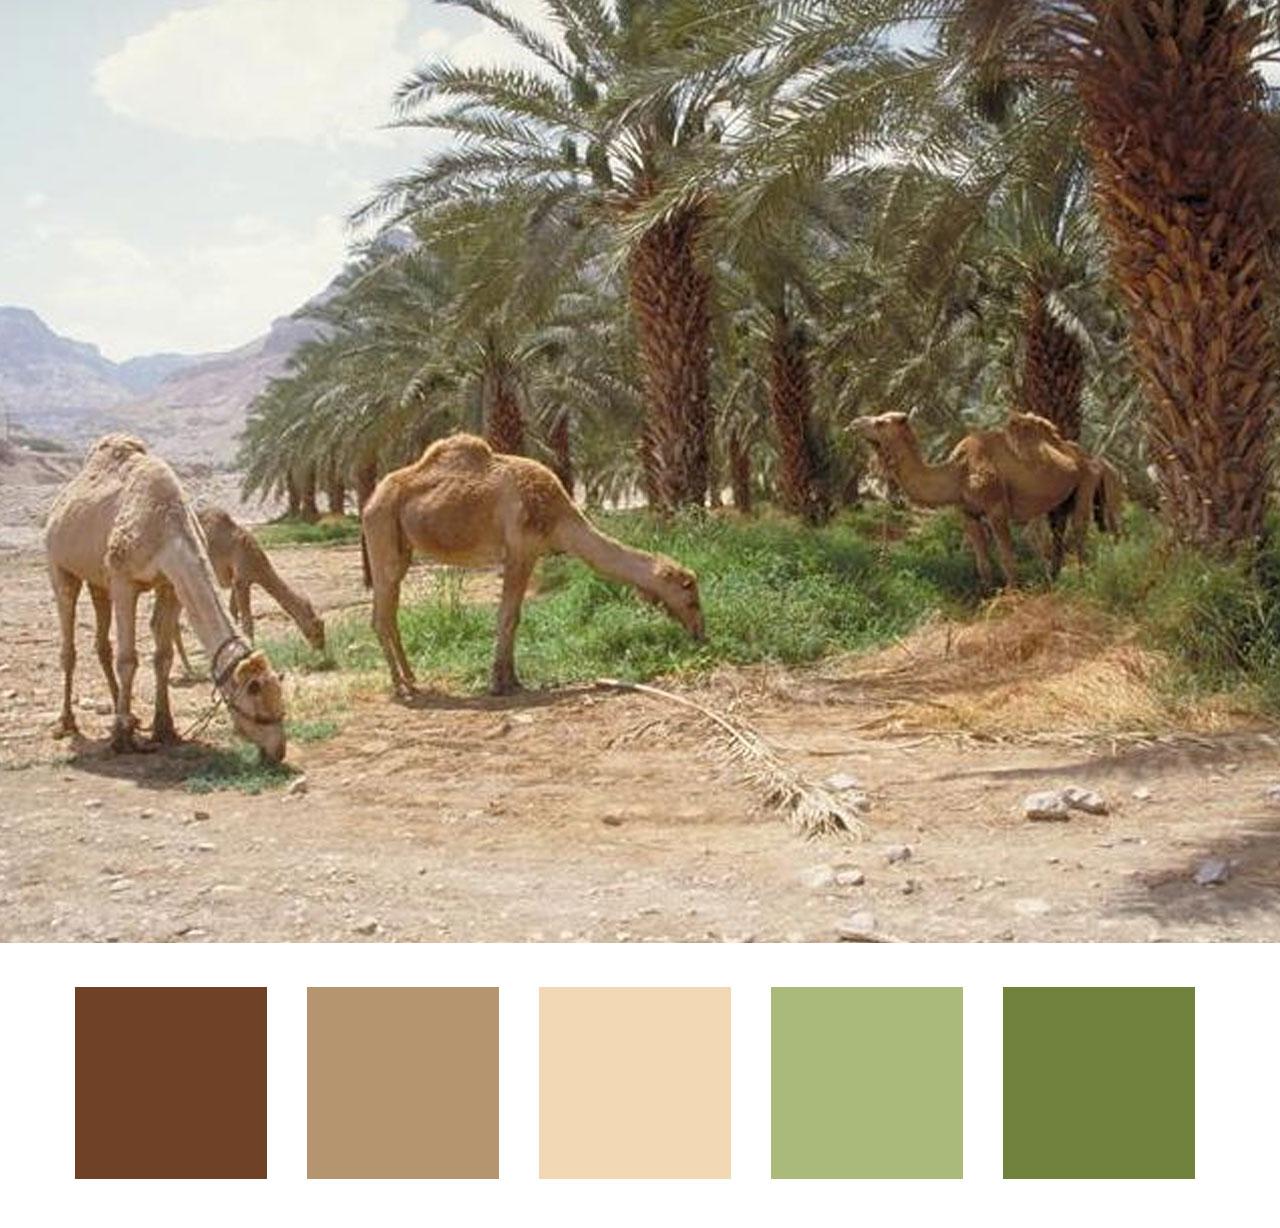 Desert scene | photo not mine - credit to come